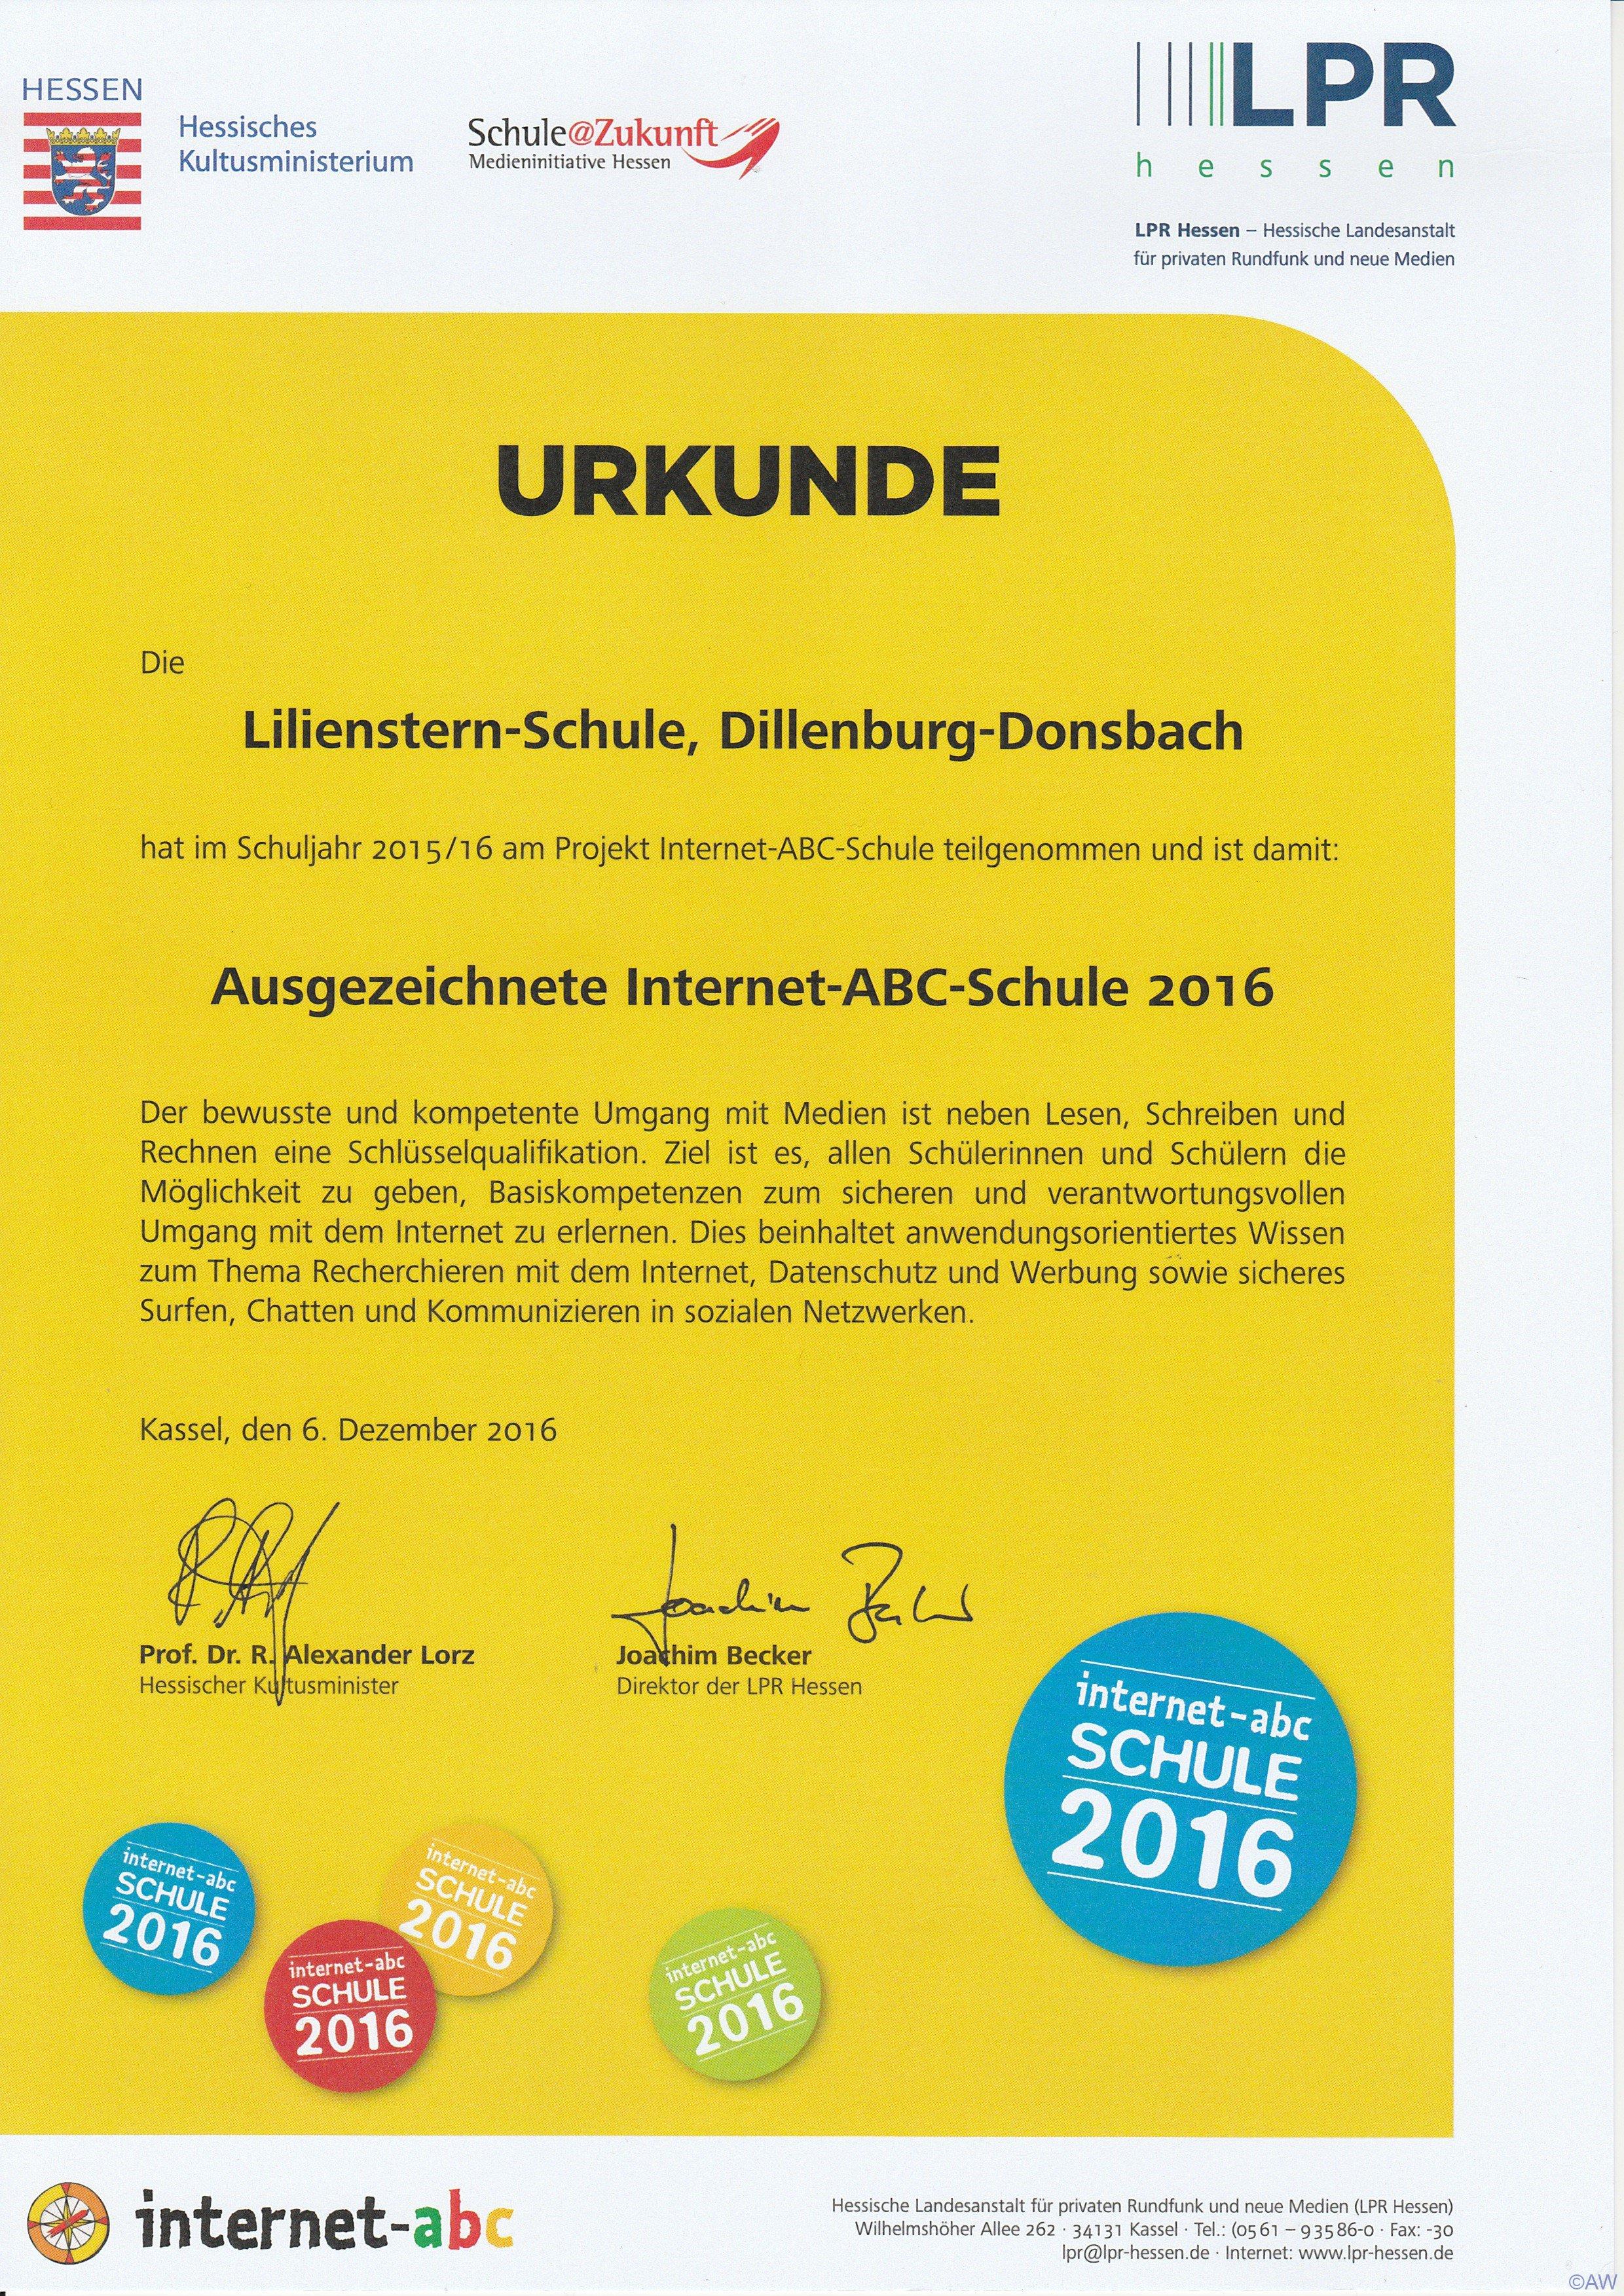 internet-abc-schule2016_0